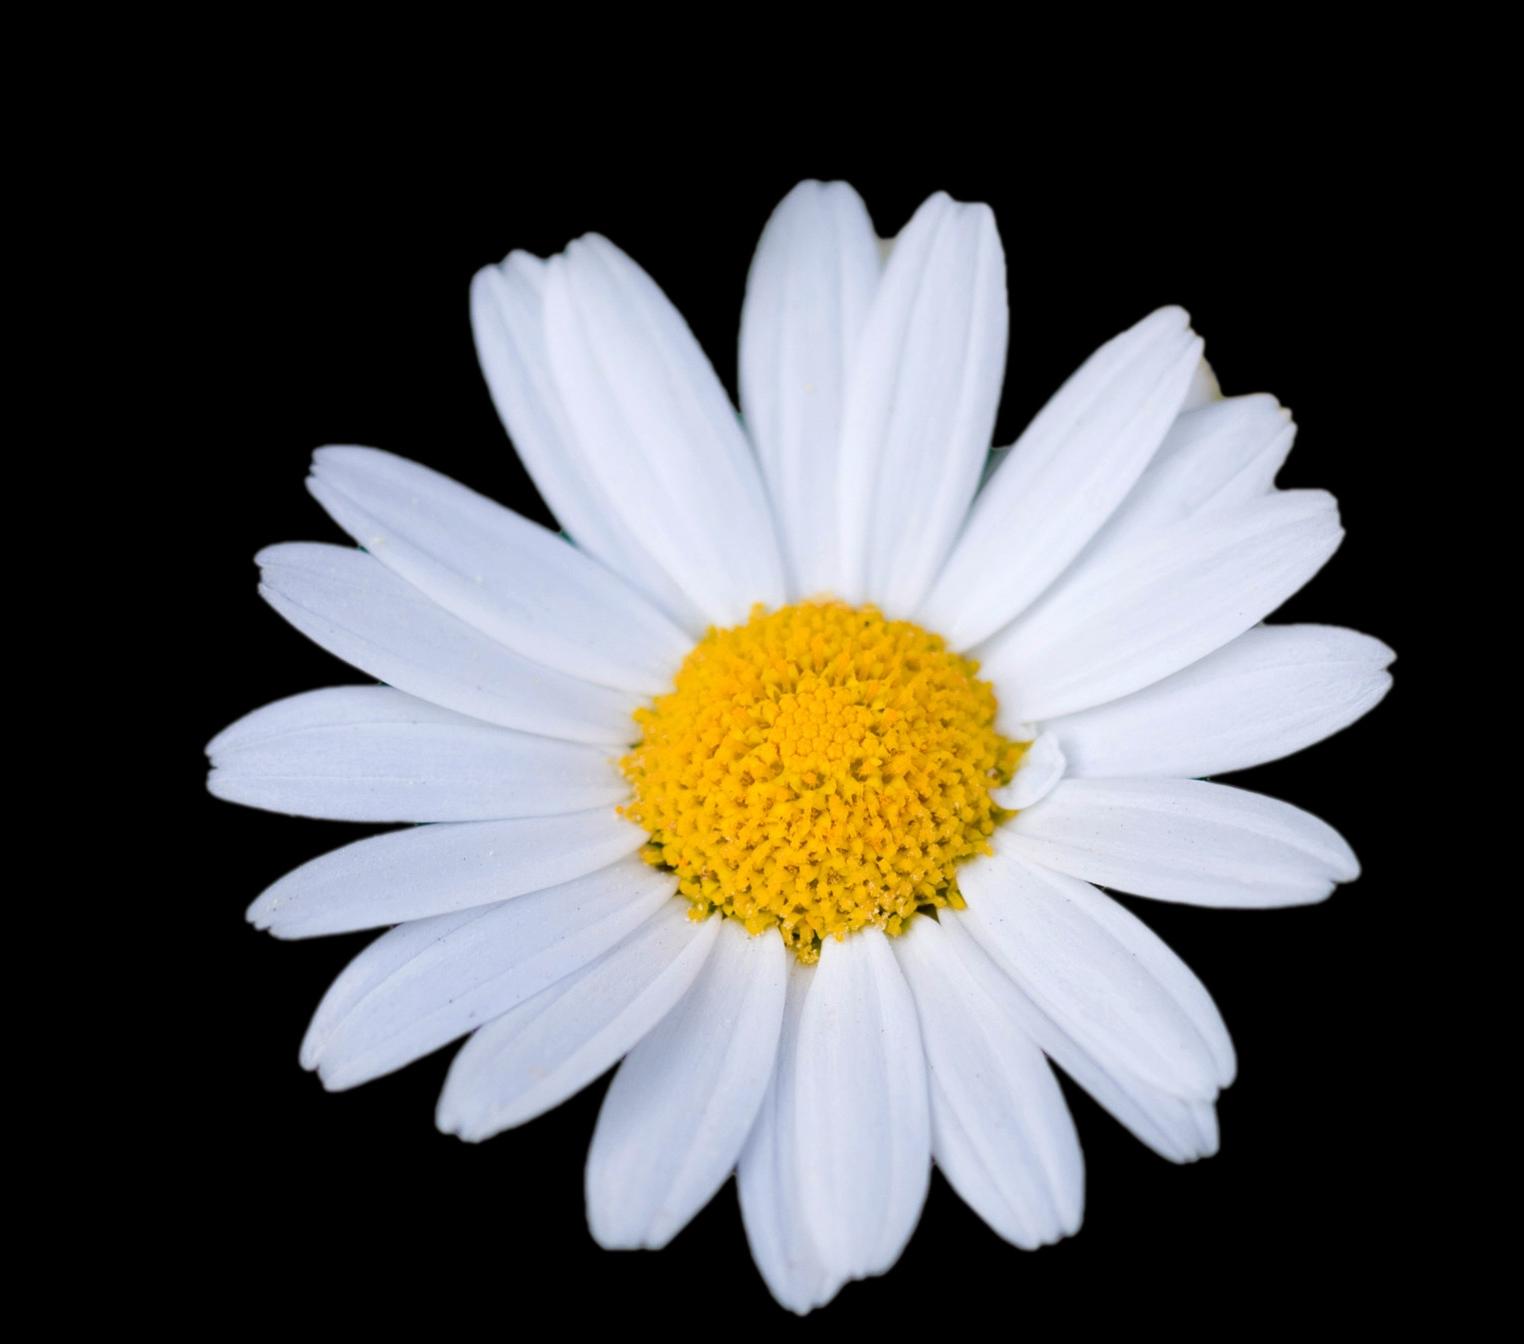 daisy-flower.jpg